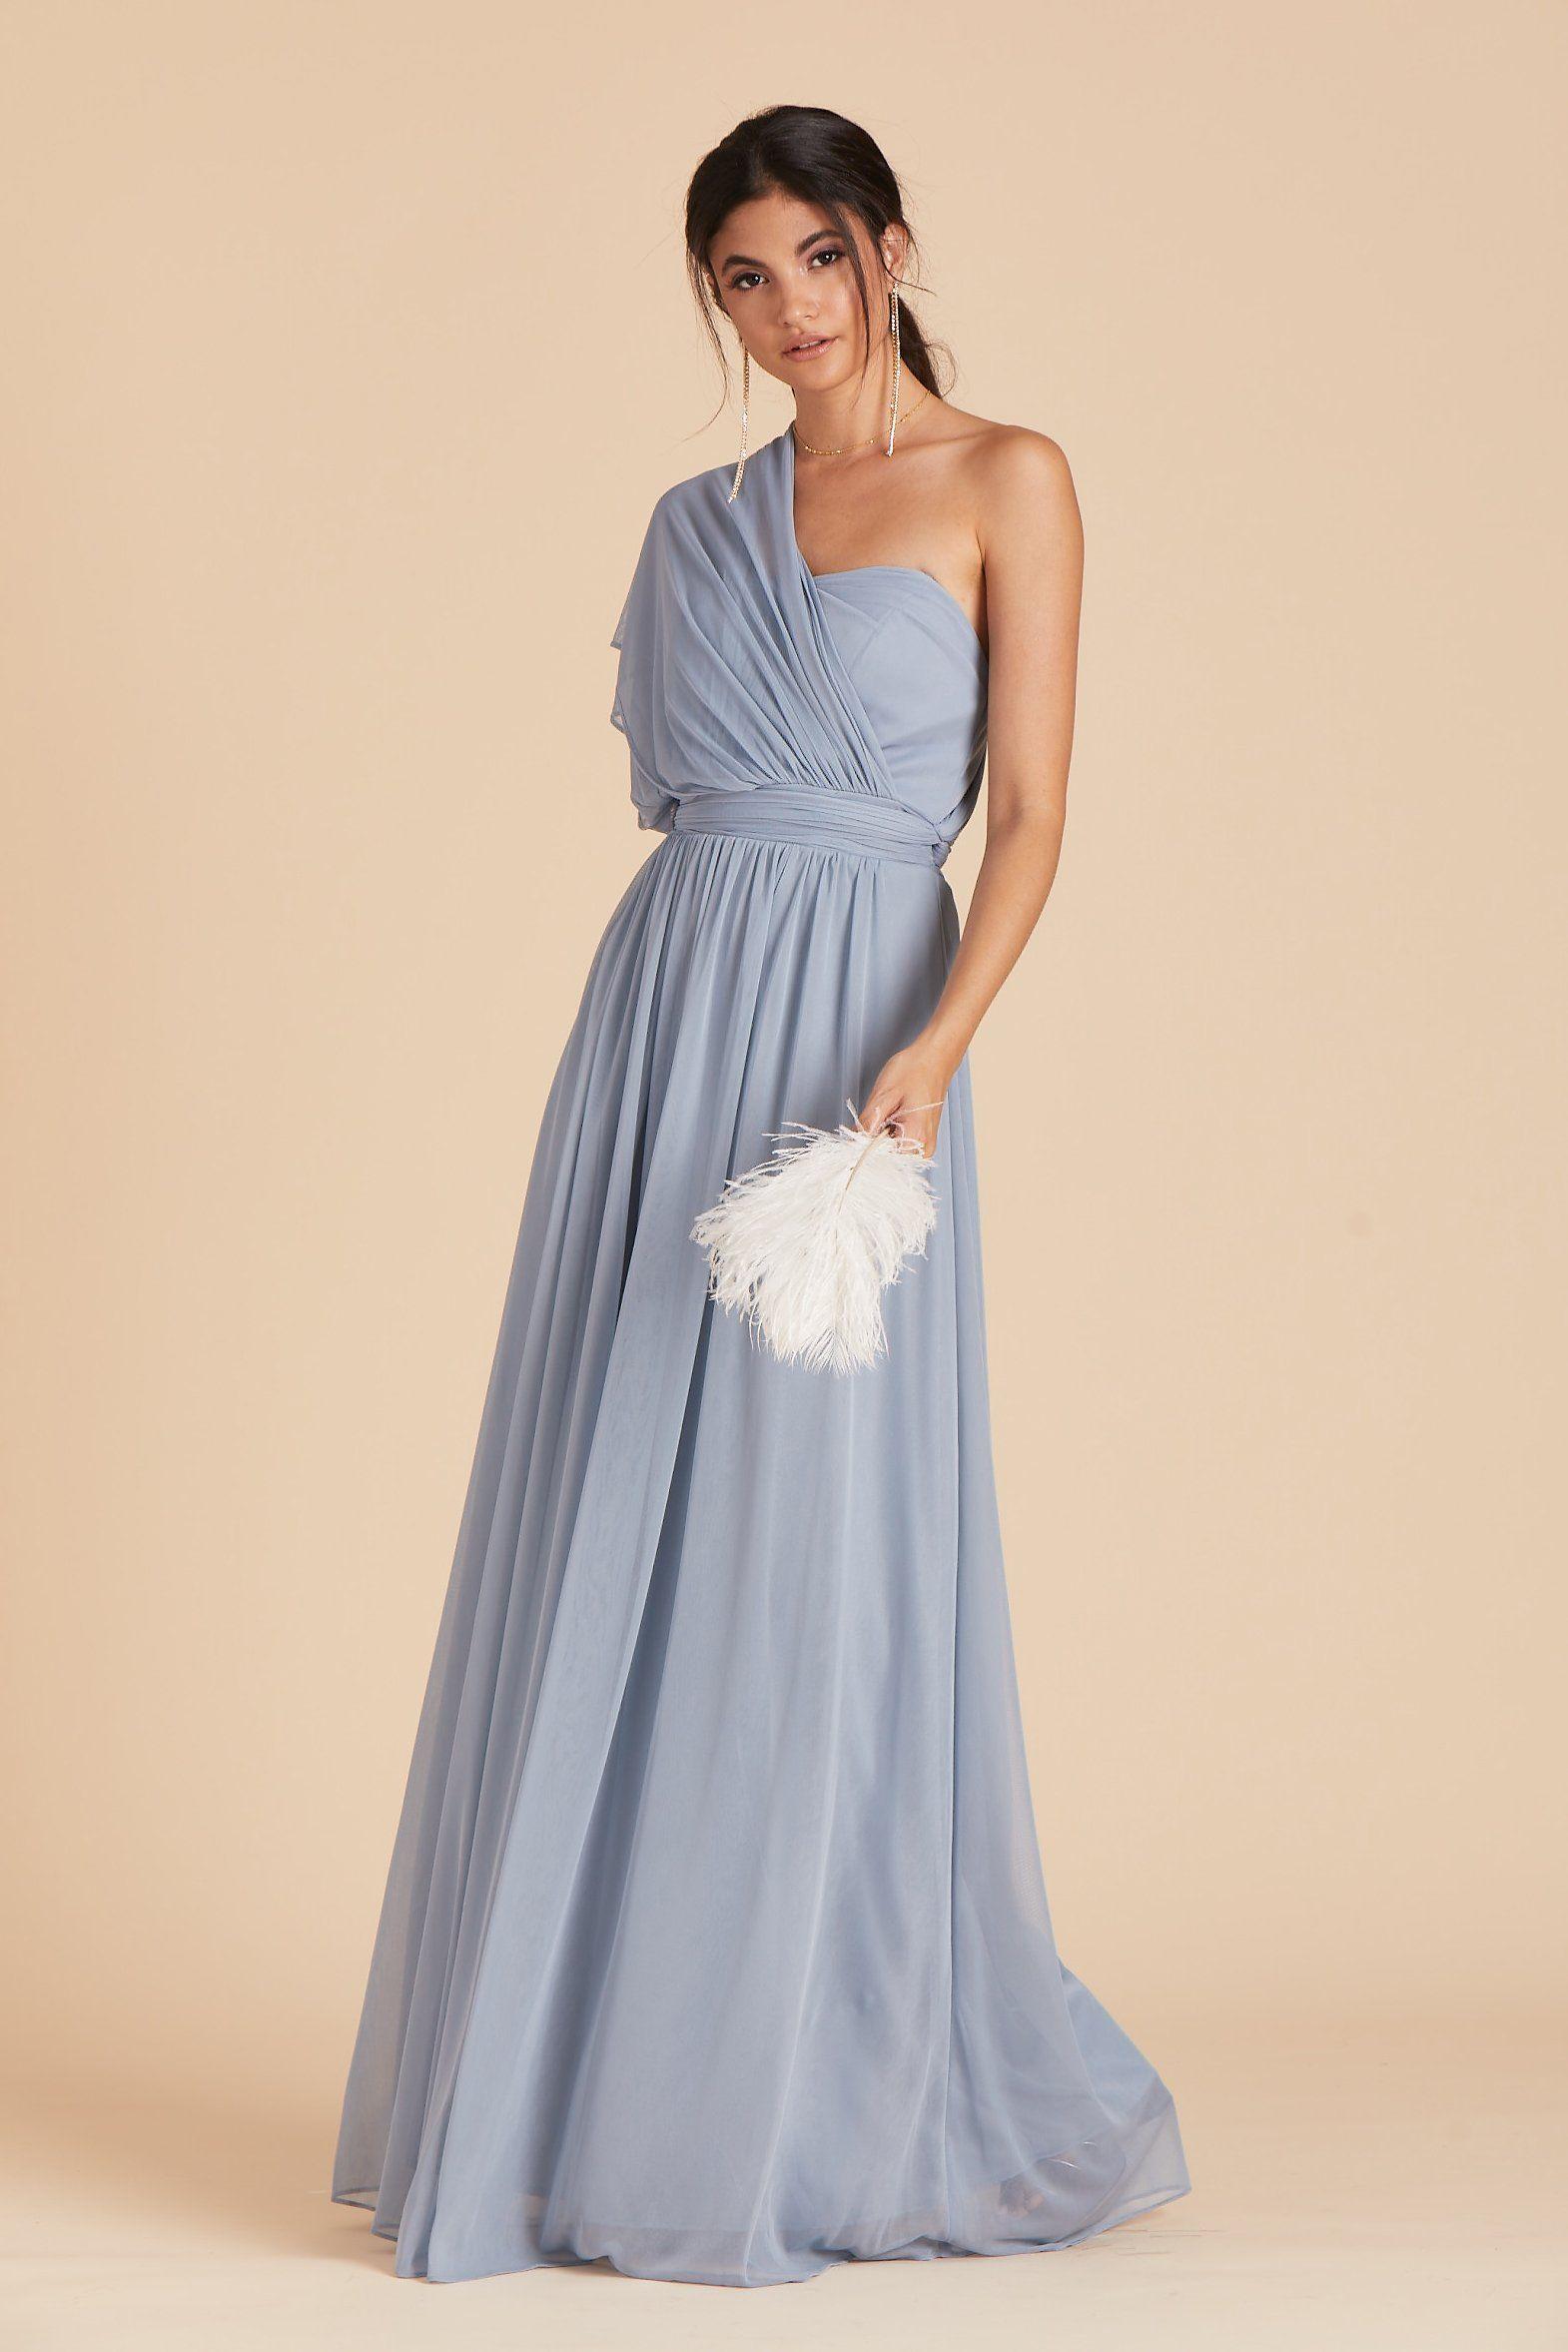 c03939093b9 Chicky Convertible Dress - Dusty Blue